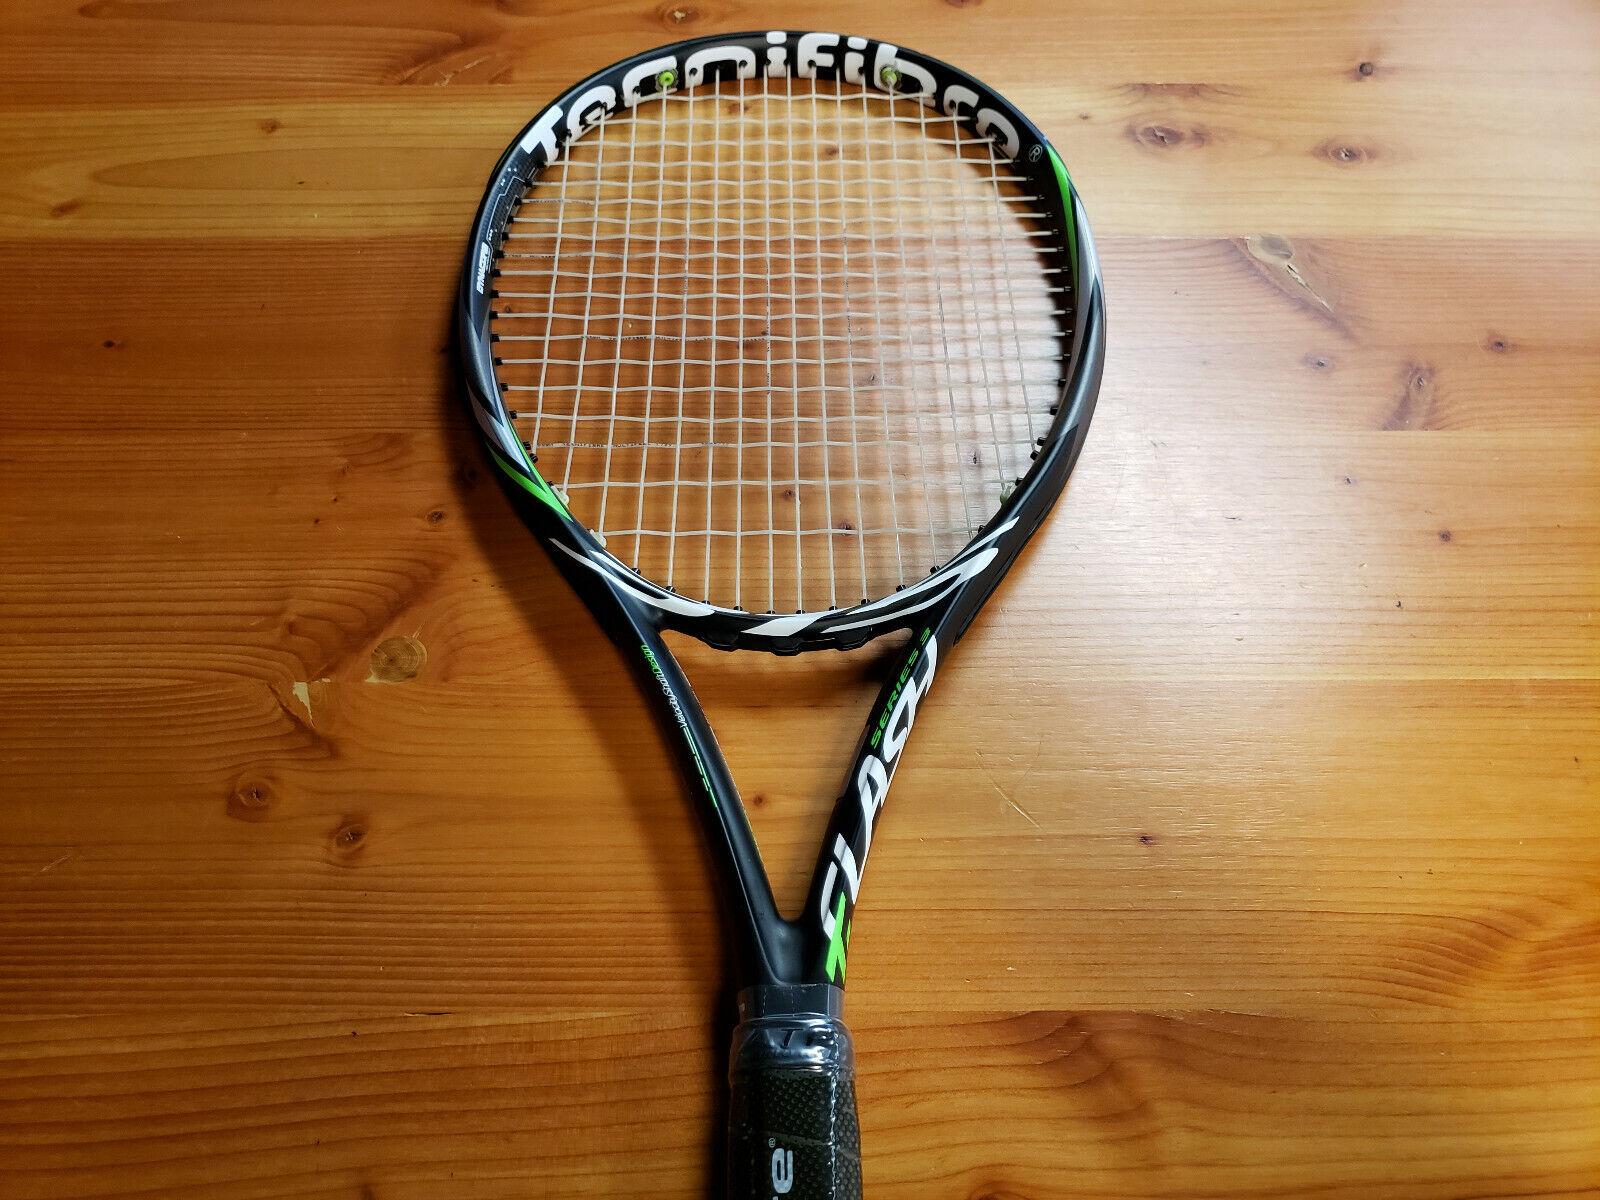 Tecnifibre Tflash 315 Dynacore Tenis Raqueta Agarre Talla 4 _ 3 8